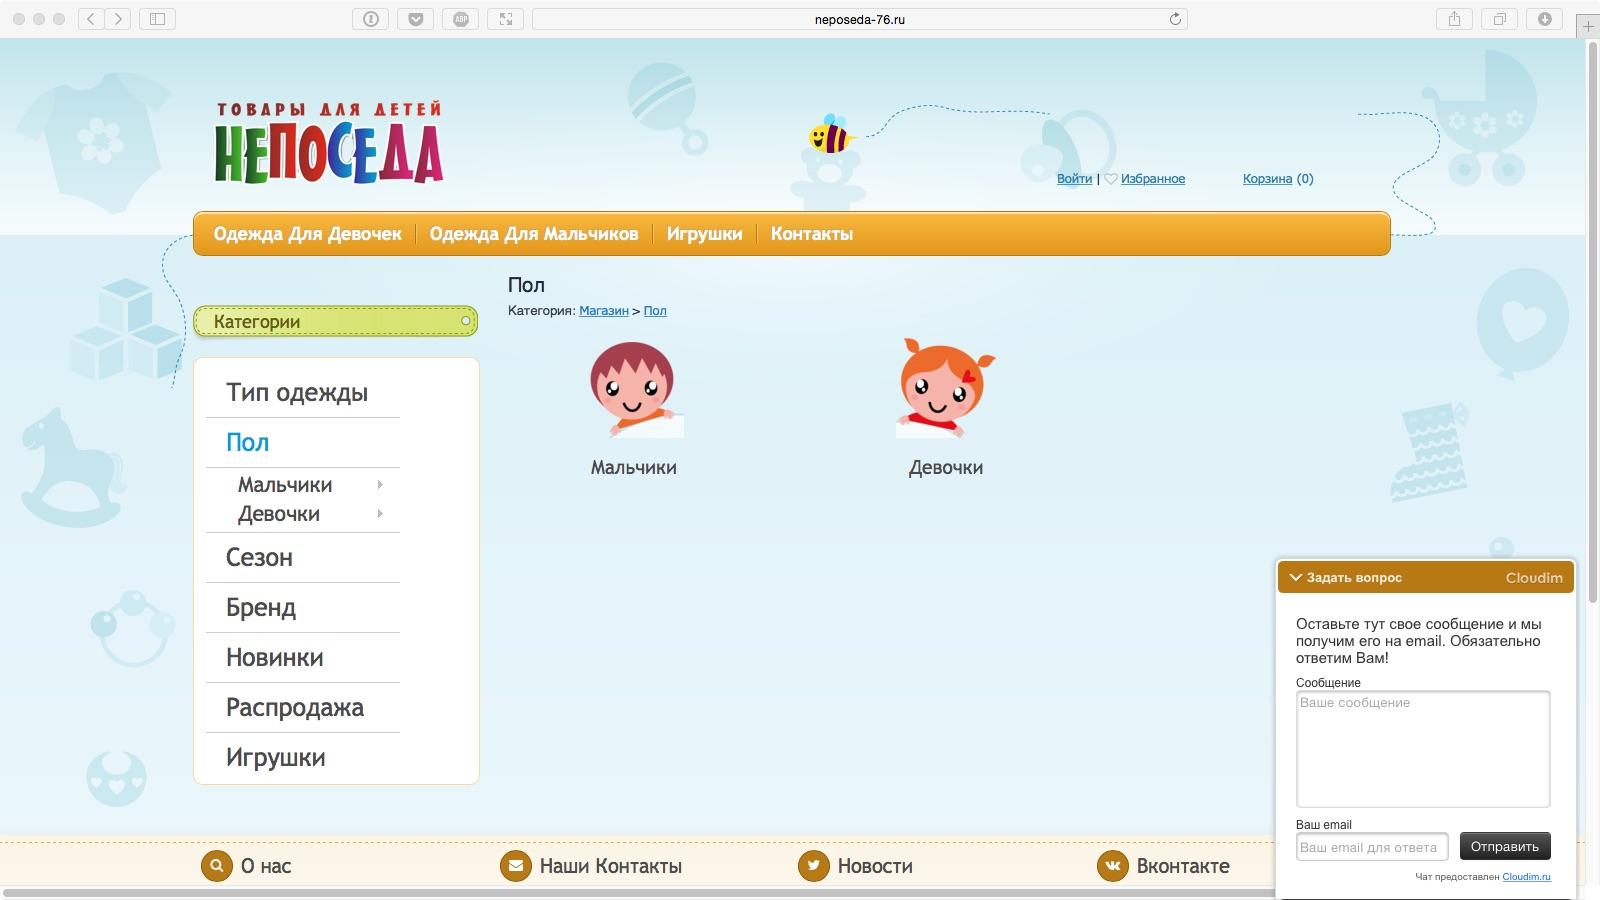 Региональный онлайн-магазин: neposeda-76.ru